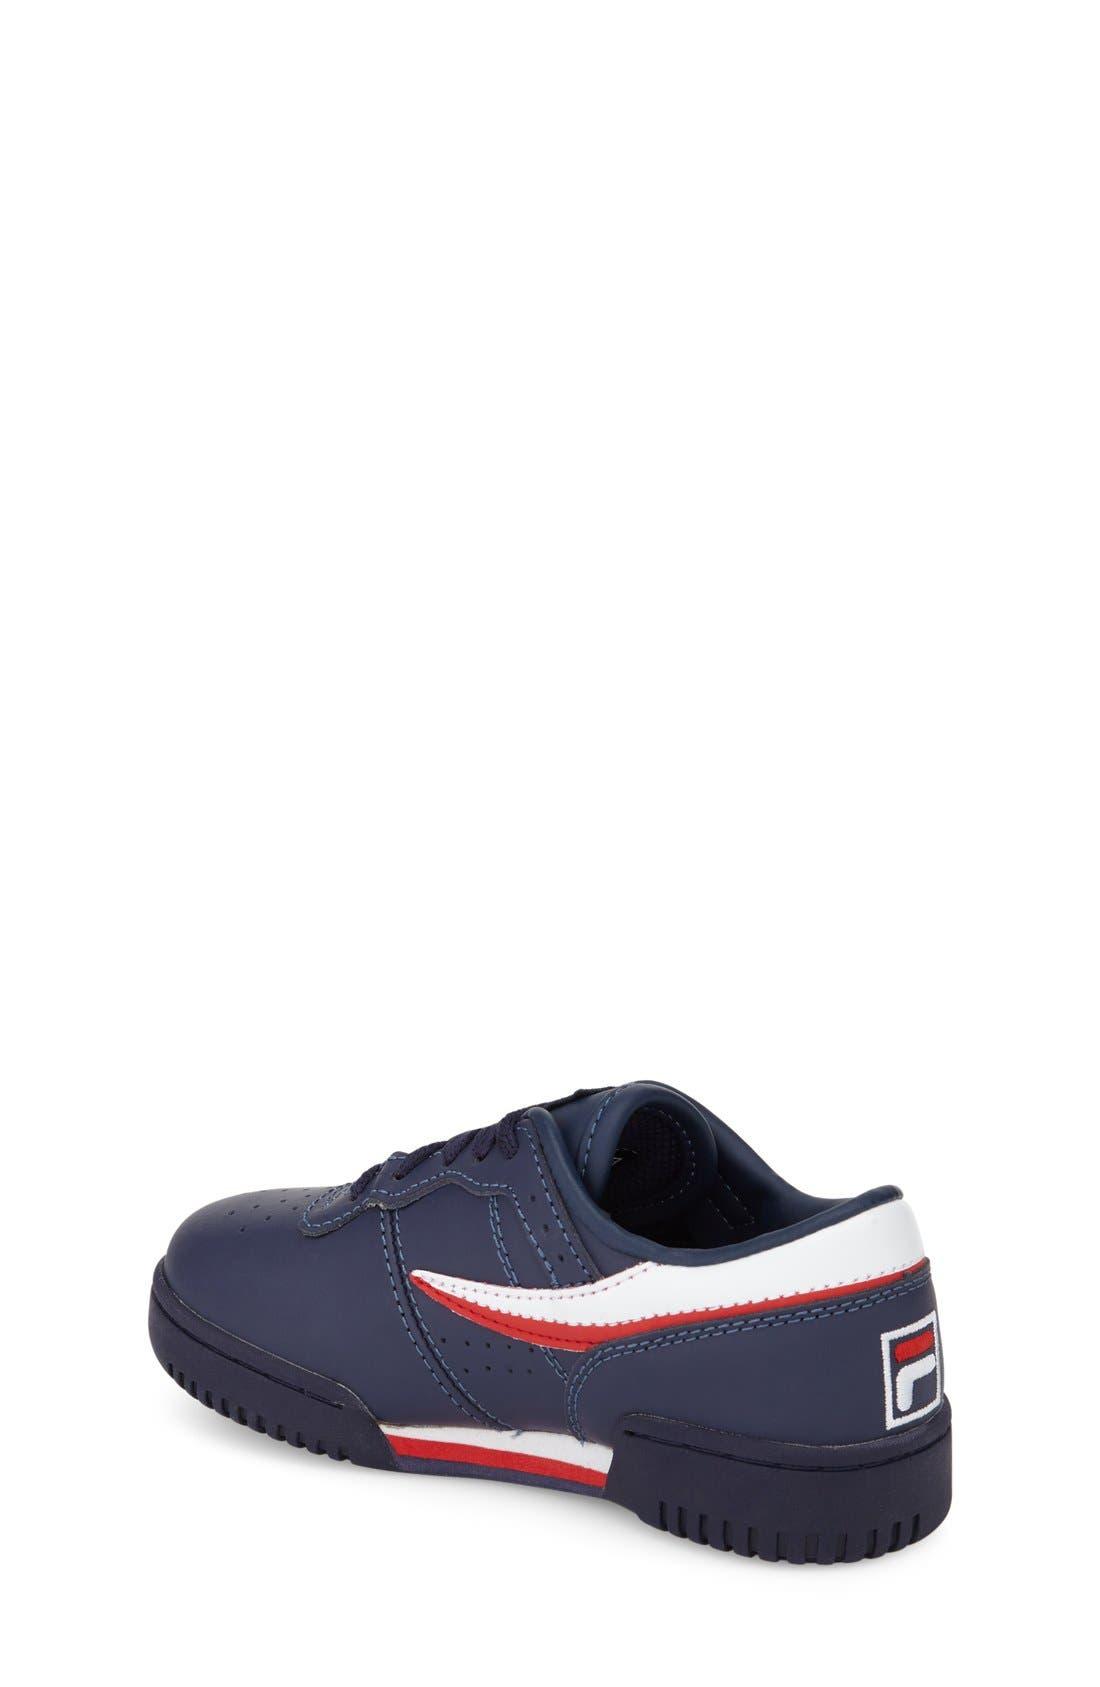 Alternate Image 2  - FILA Original Sneaker (Toddler, Little Kid & Big Kid)